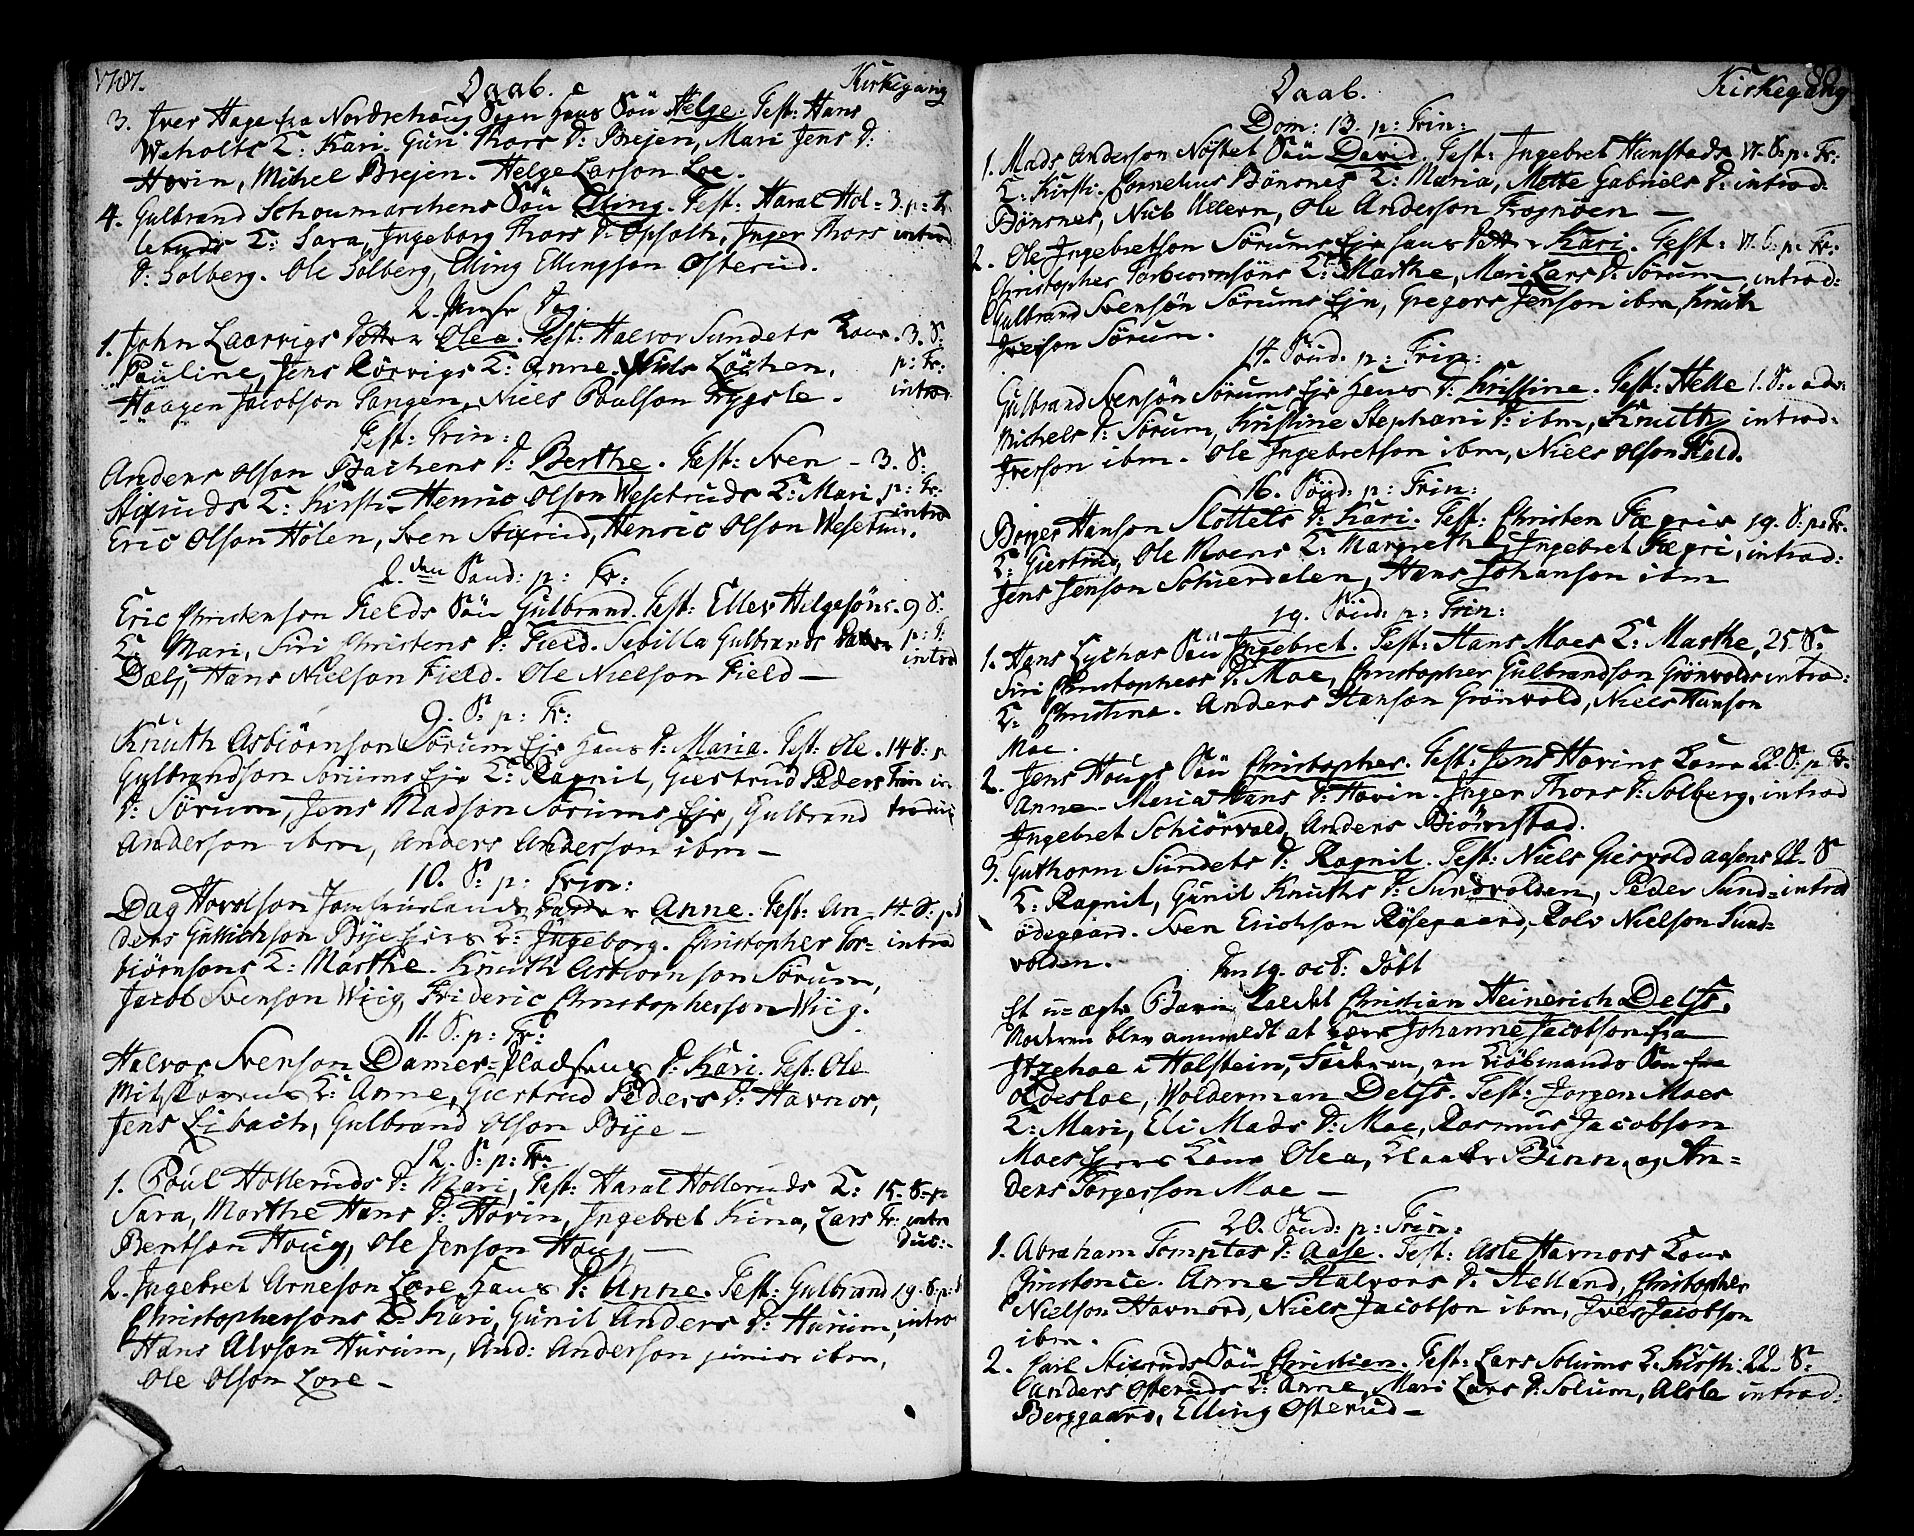 SAKO, Hole kirkebøker, F/Fa/L0002: Ministerialbok nr. I 2, 1766-1814, s. 80